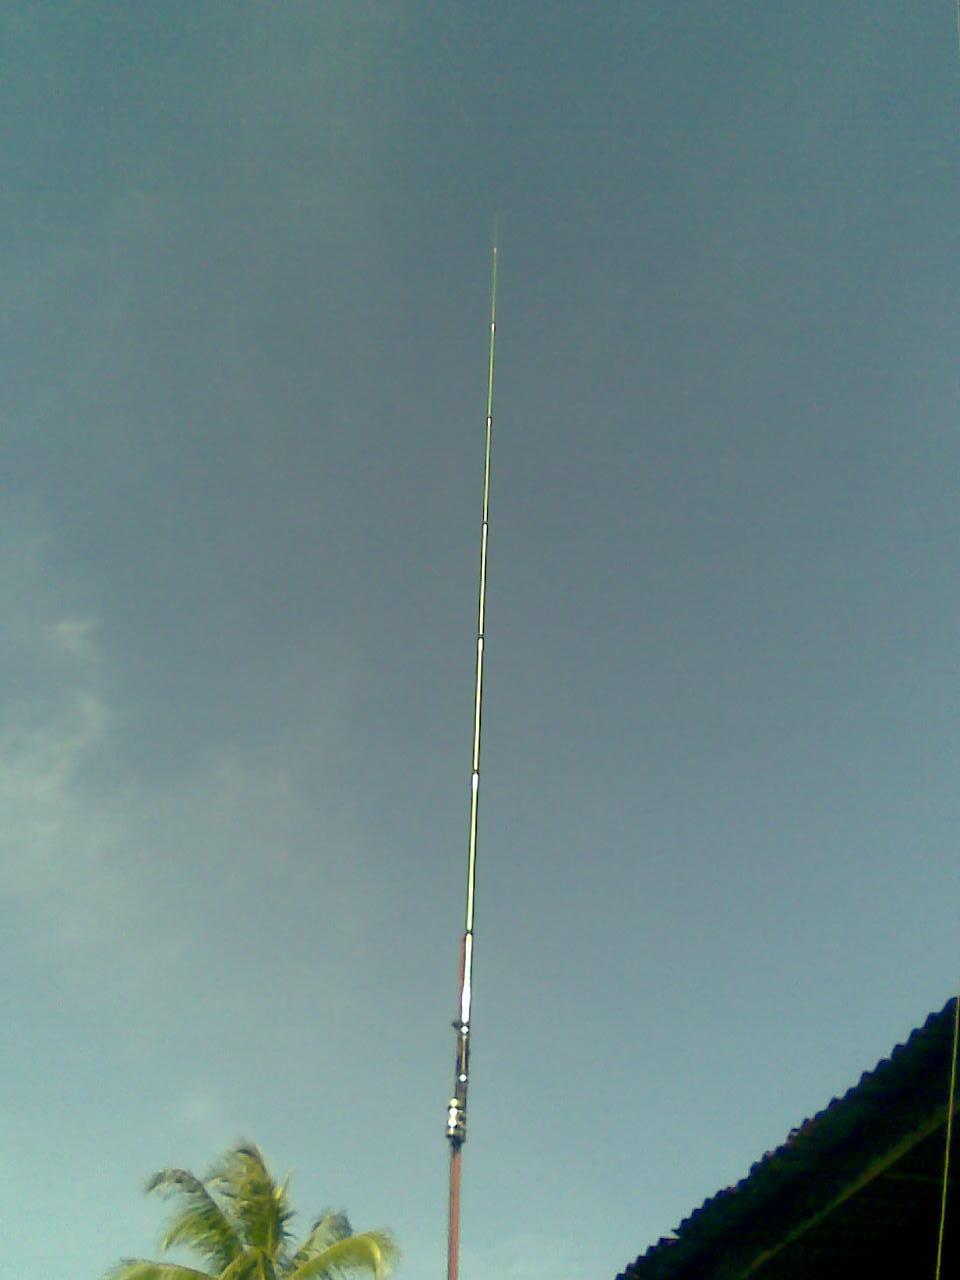 9m2mso All Bands Vertical Antenna Hf Homebrew